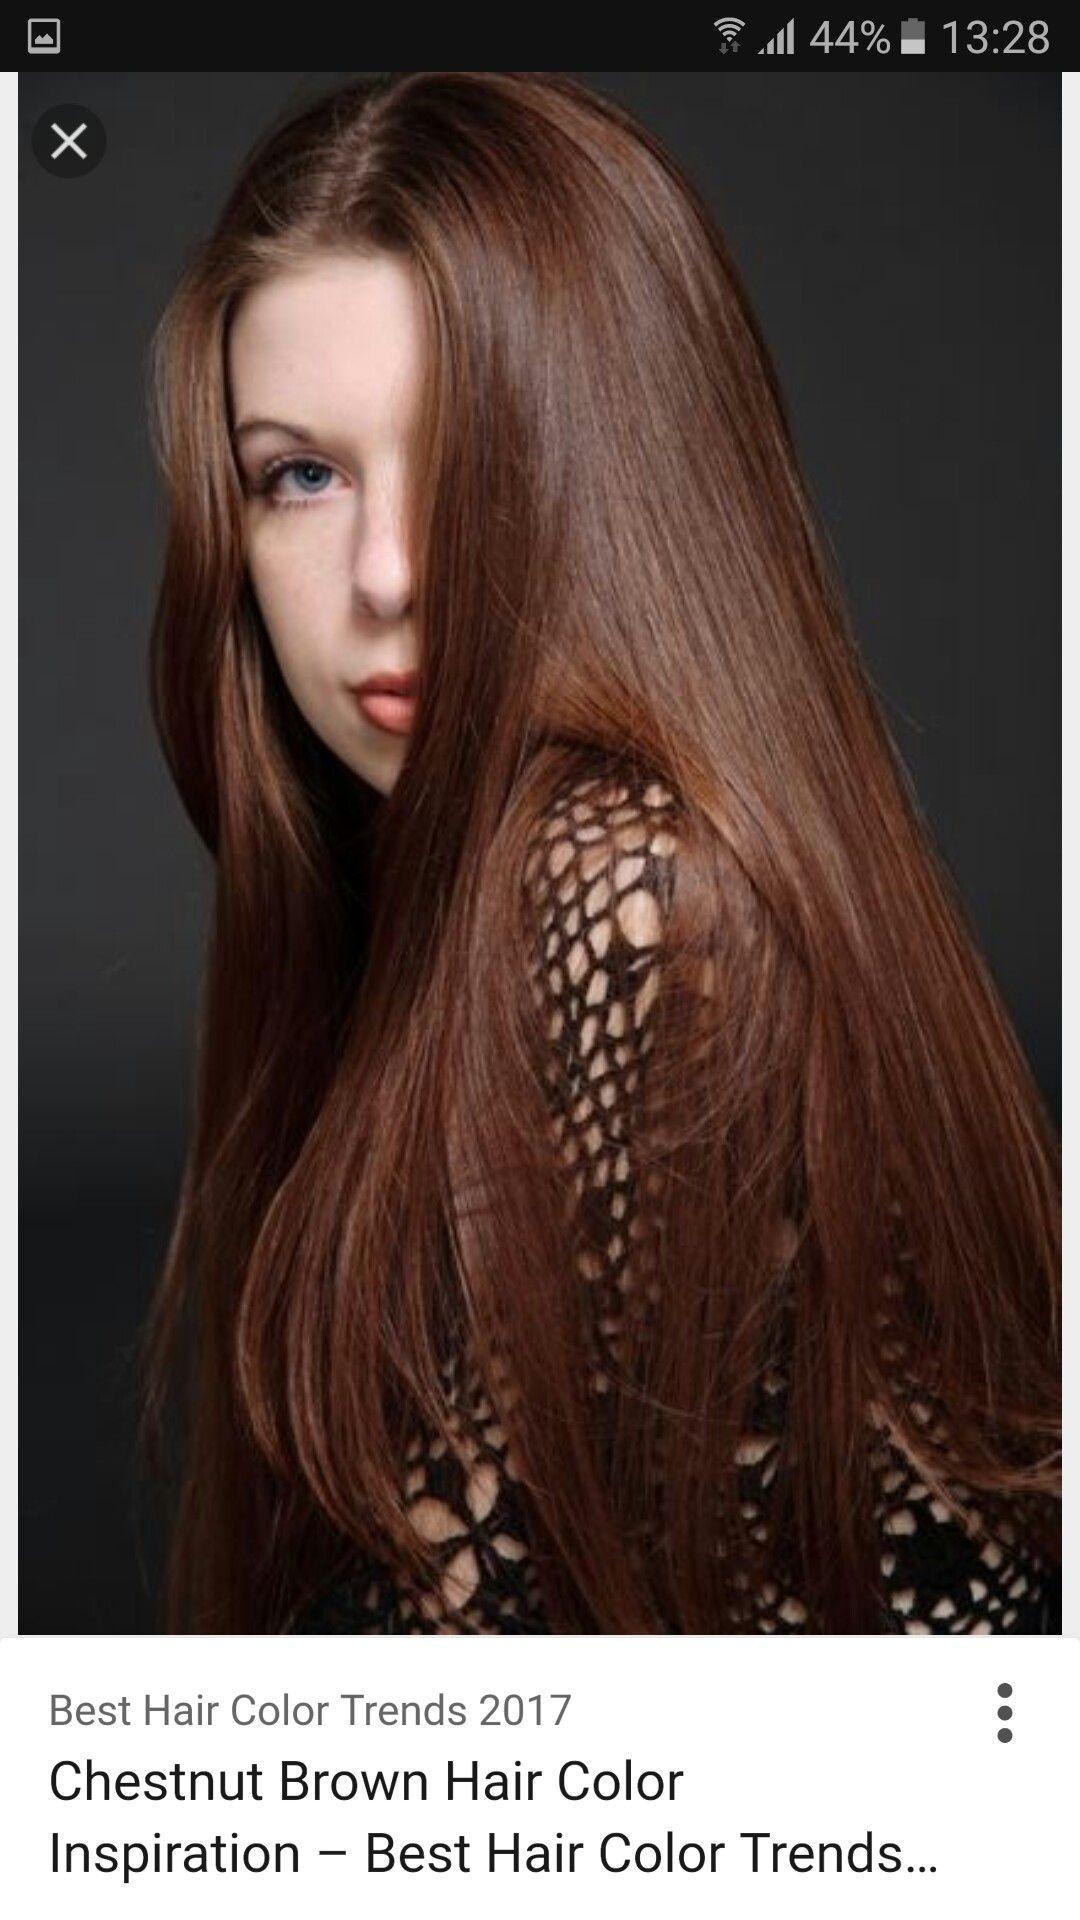 Pin By Ania Mc On Hair Auburn Chestnut Kasztan Pinterest